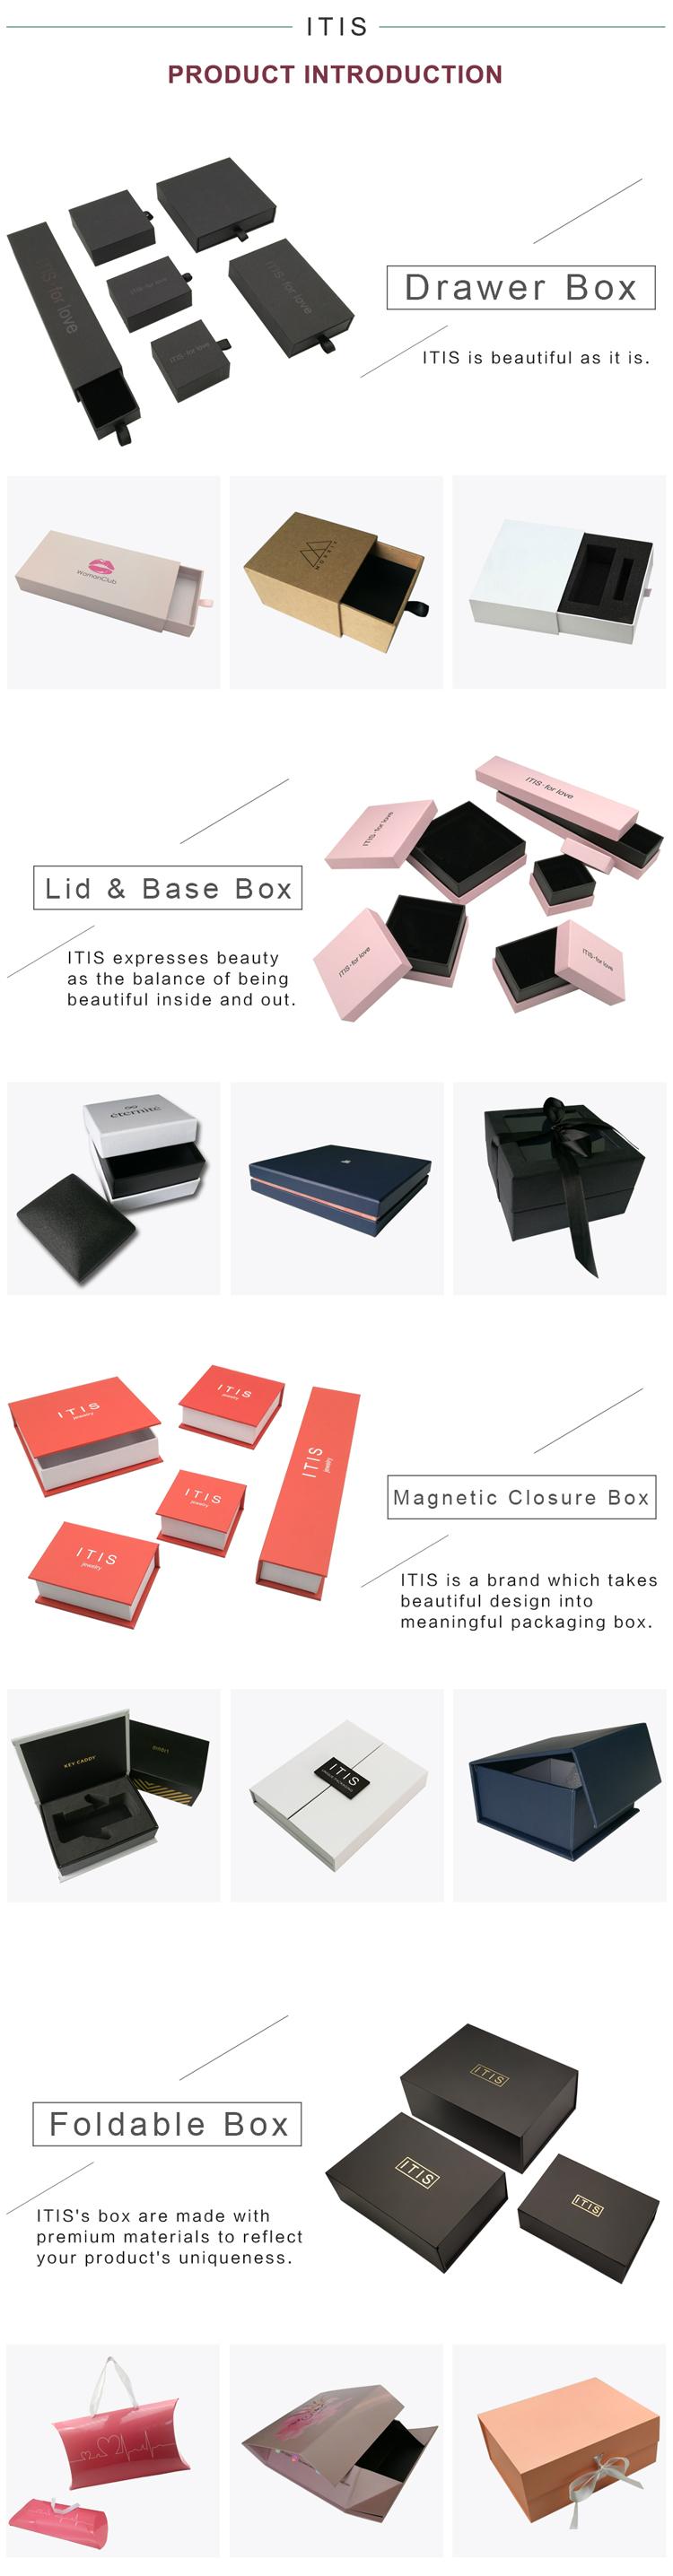 Packaging-Drawer-Box.jpg